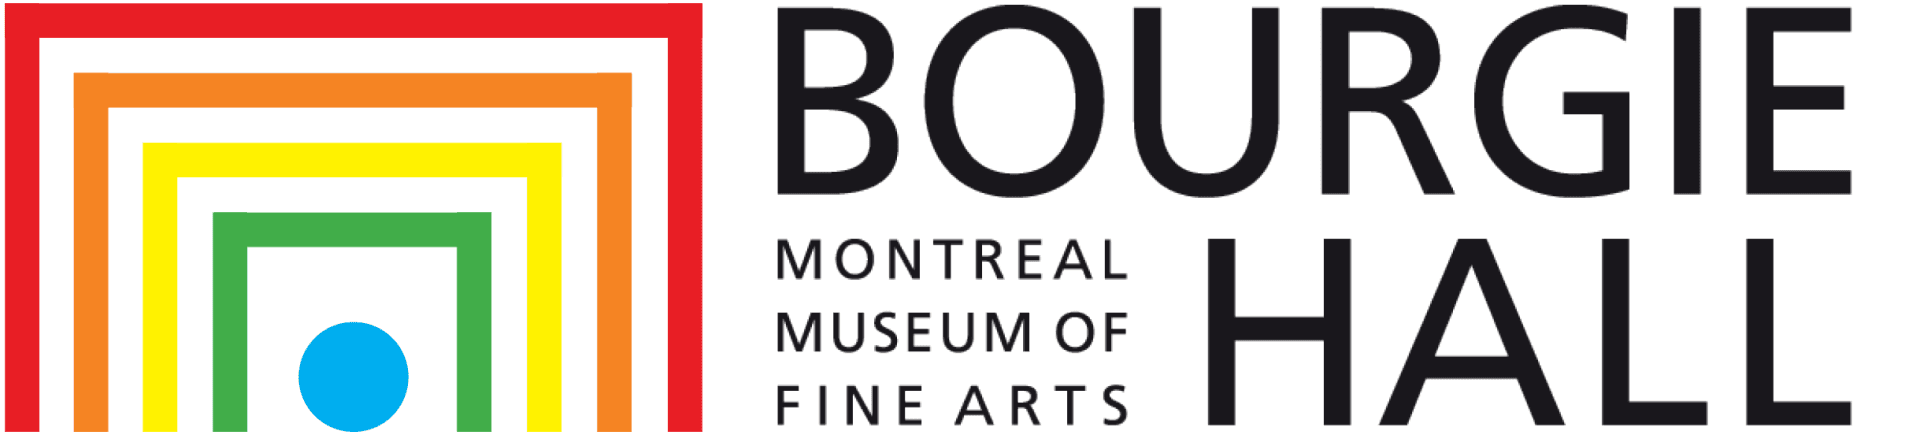 Bourgie Hall logo